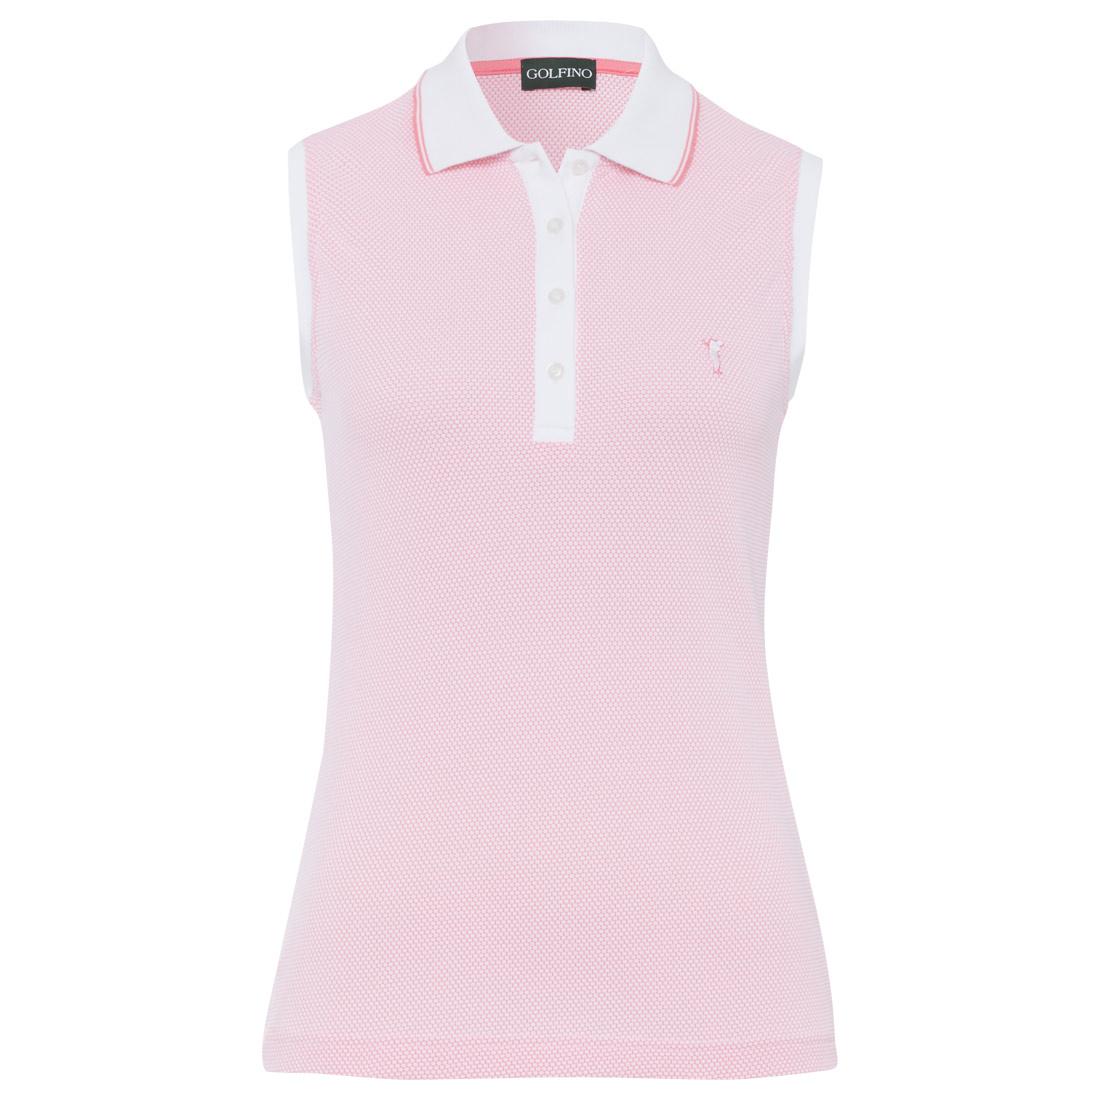 Ärmelloses Damen Golfpolo leicht und atmungsaktiv